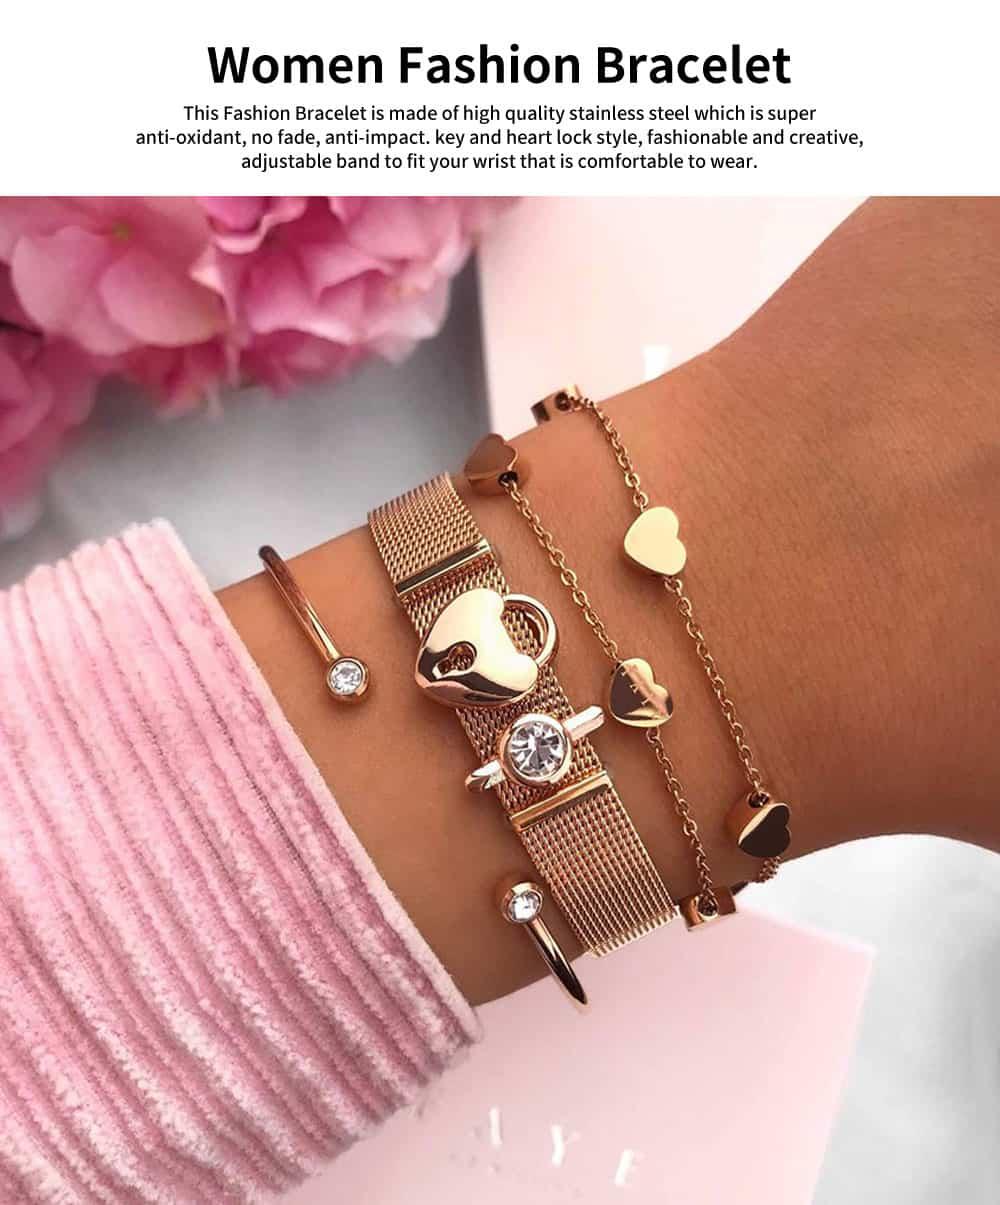 Lady Key Heart Padlock Mesh Bracelet, Charm Dress Bracelets Valentines Gift for Girlfriend 0